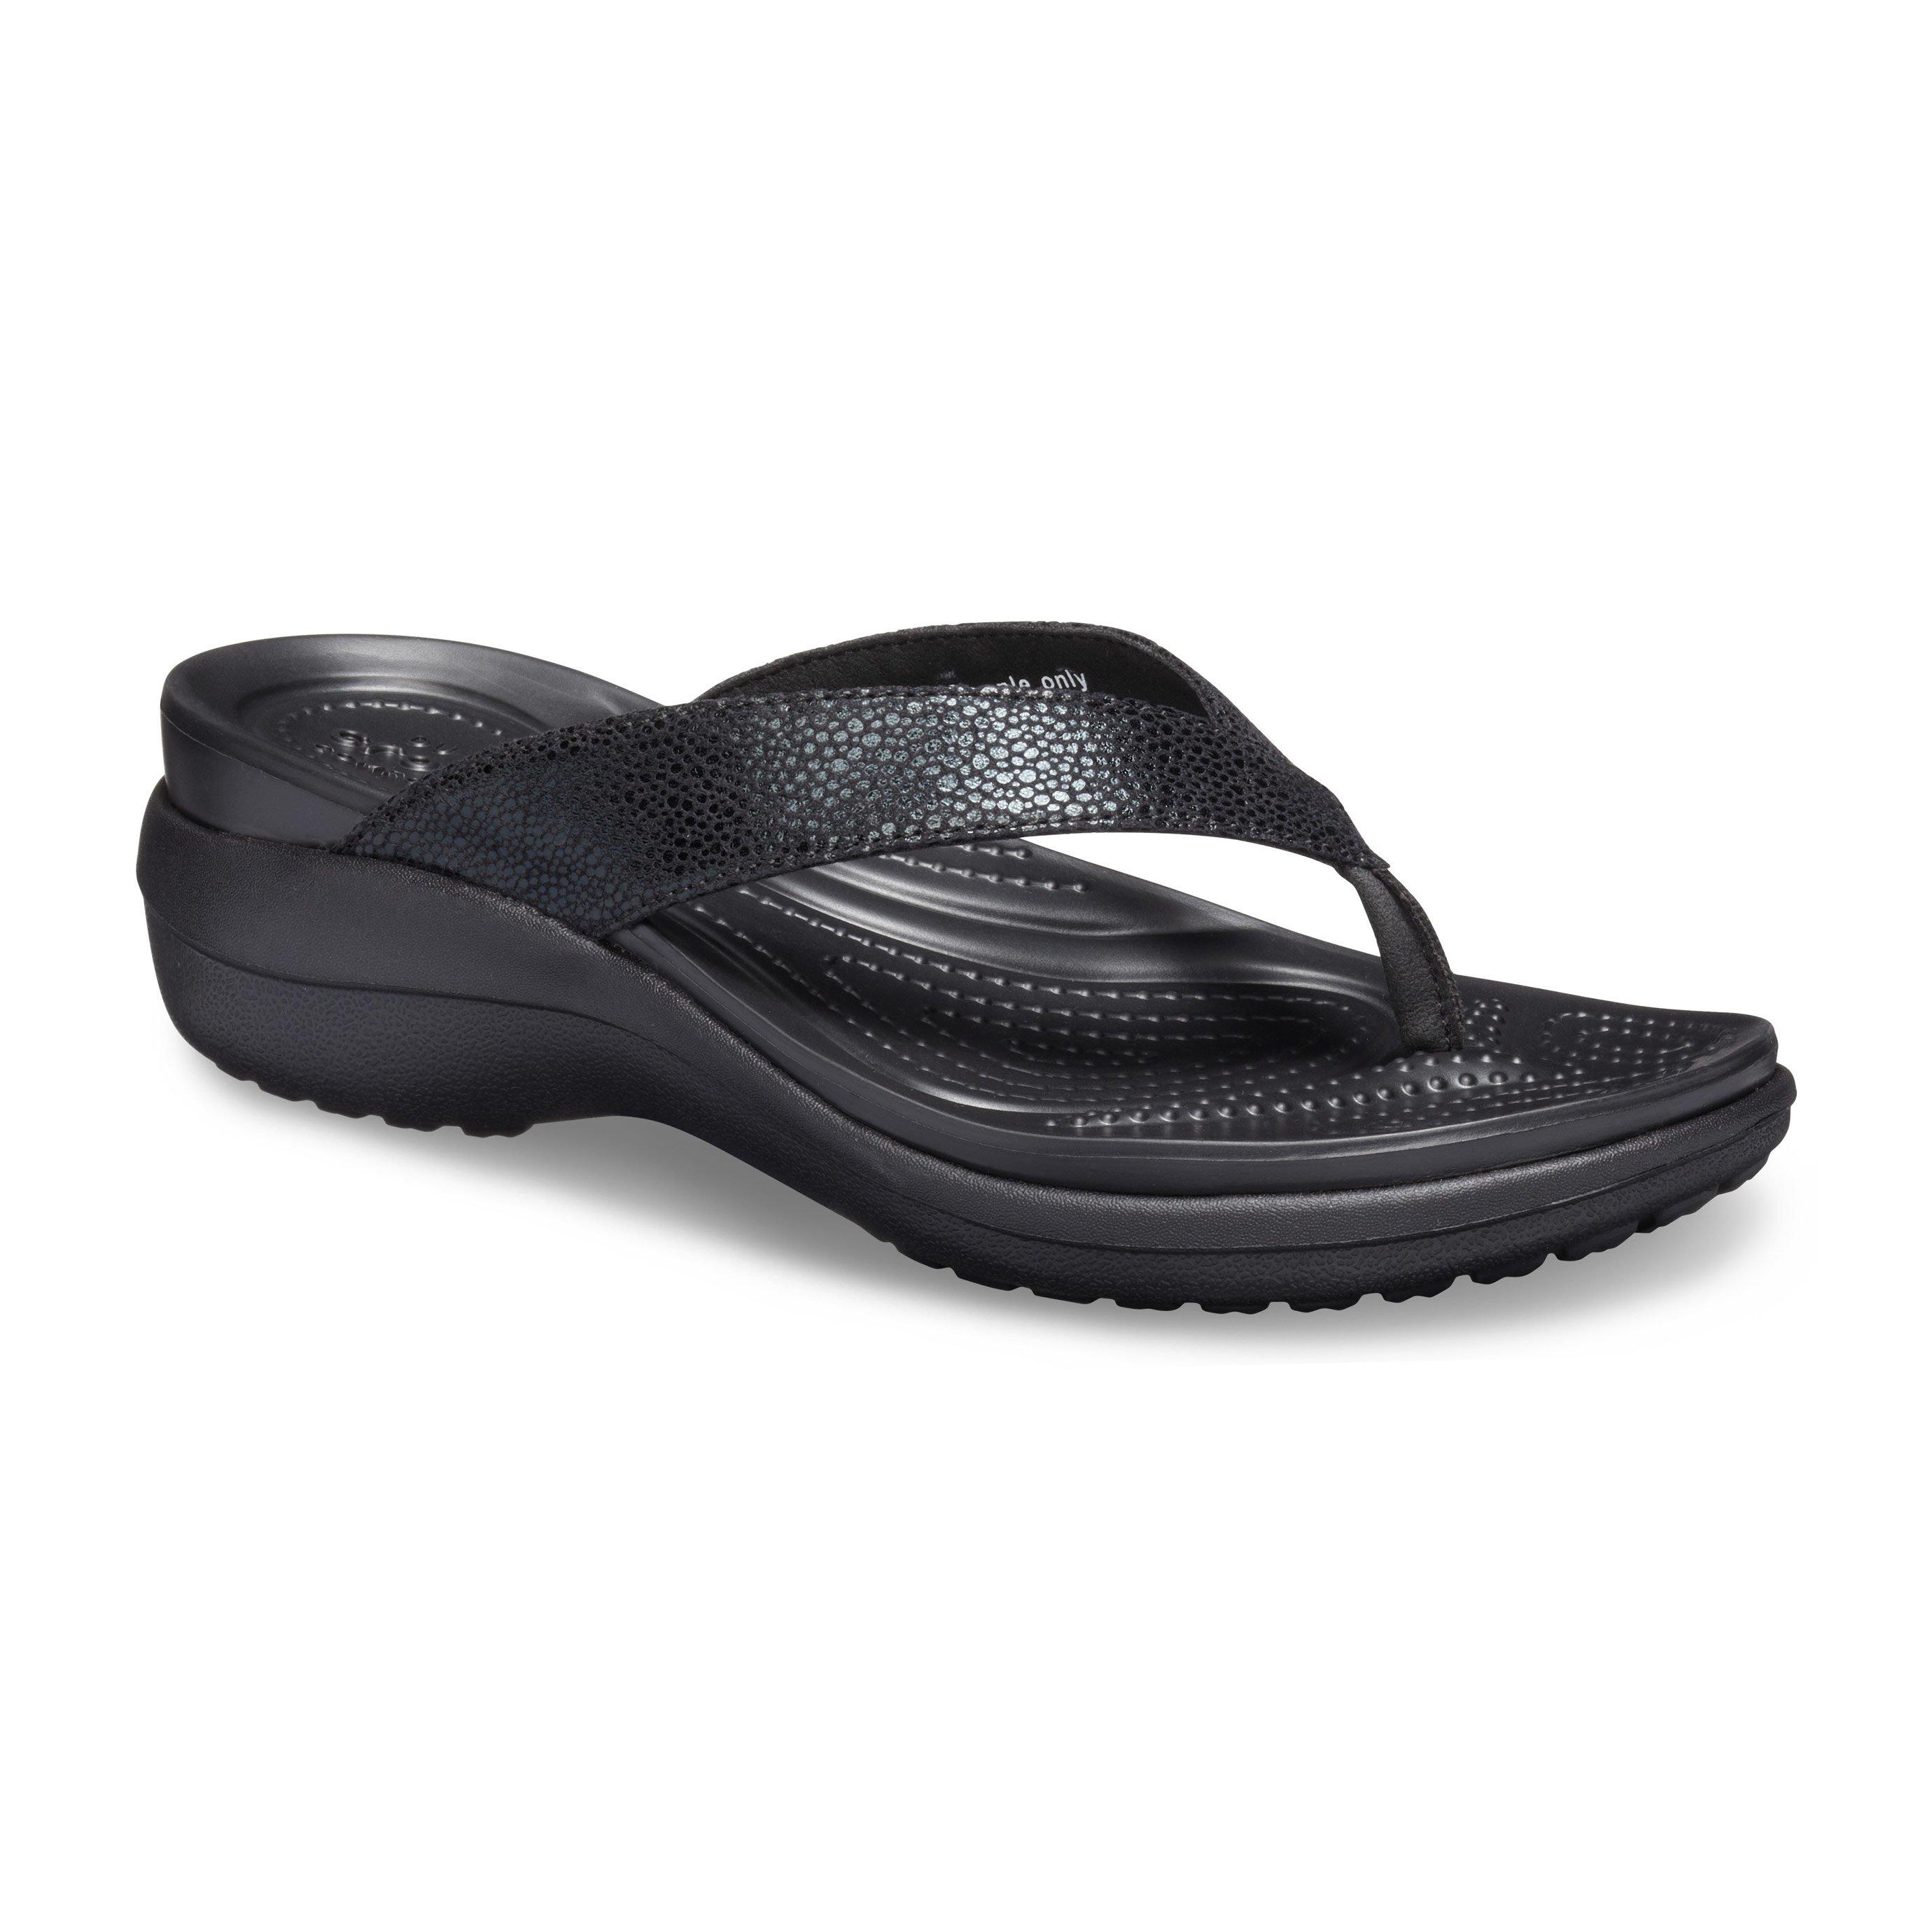 Crocs Capri Metallictxt Wedge Flip - כפכפי אצבע עם טקסטורה מטאלית בצבע שחור